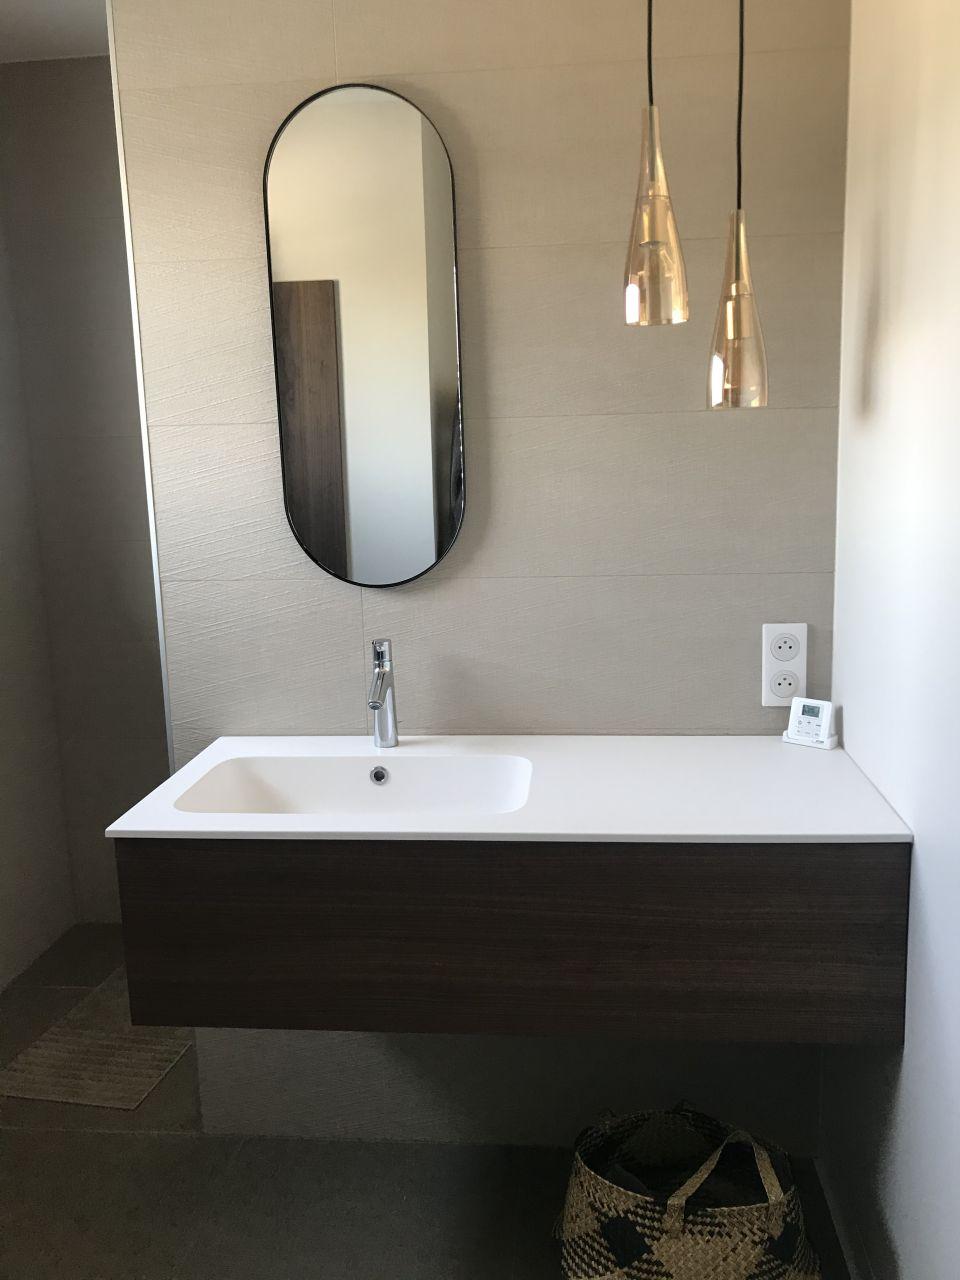 Salle de bain parentale terminée